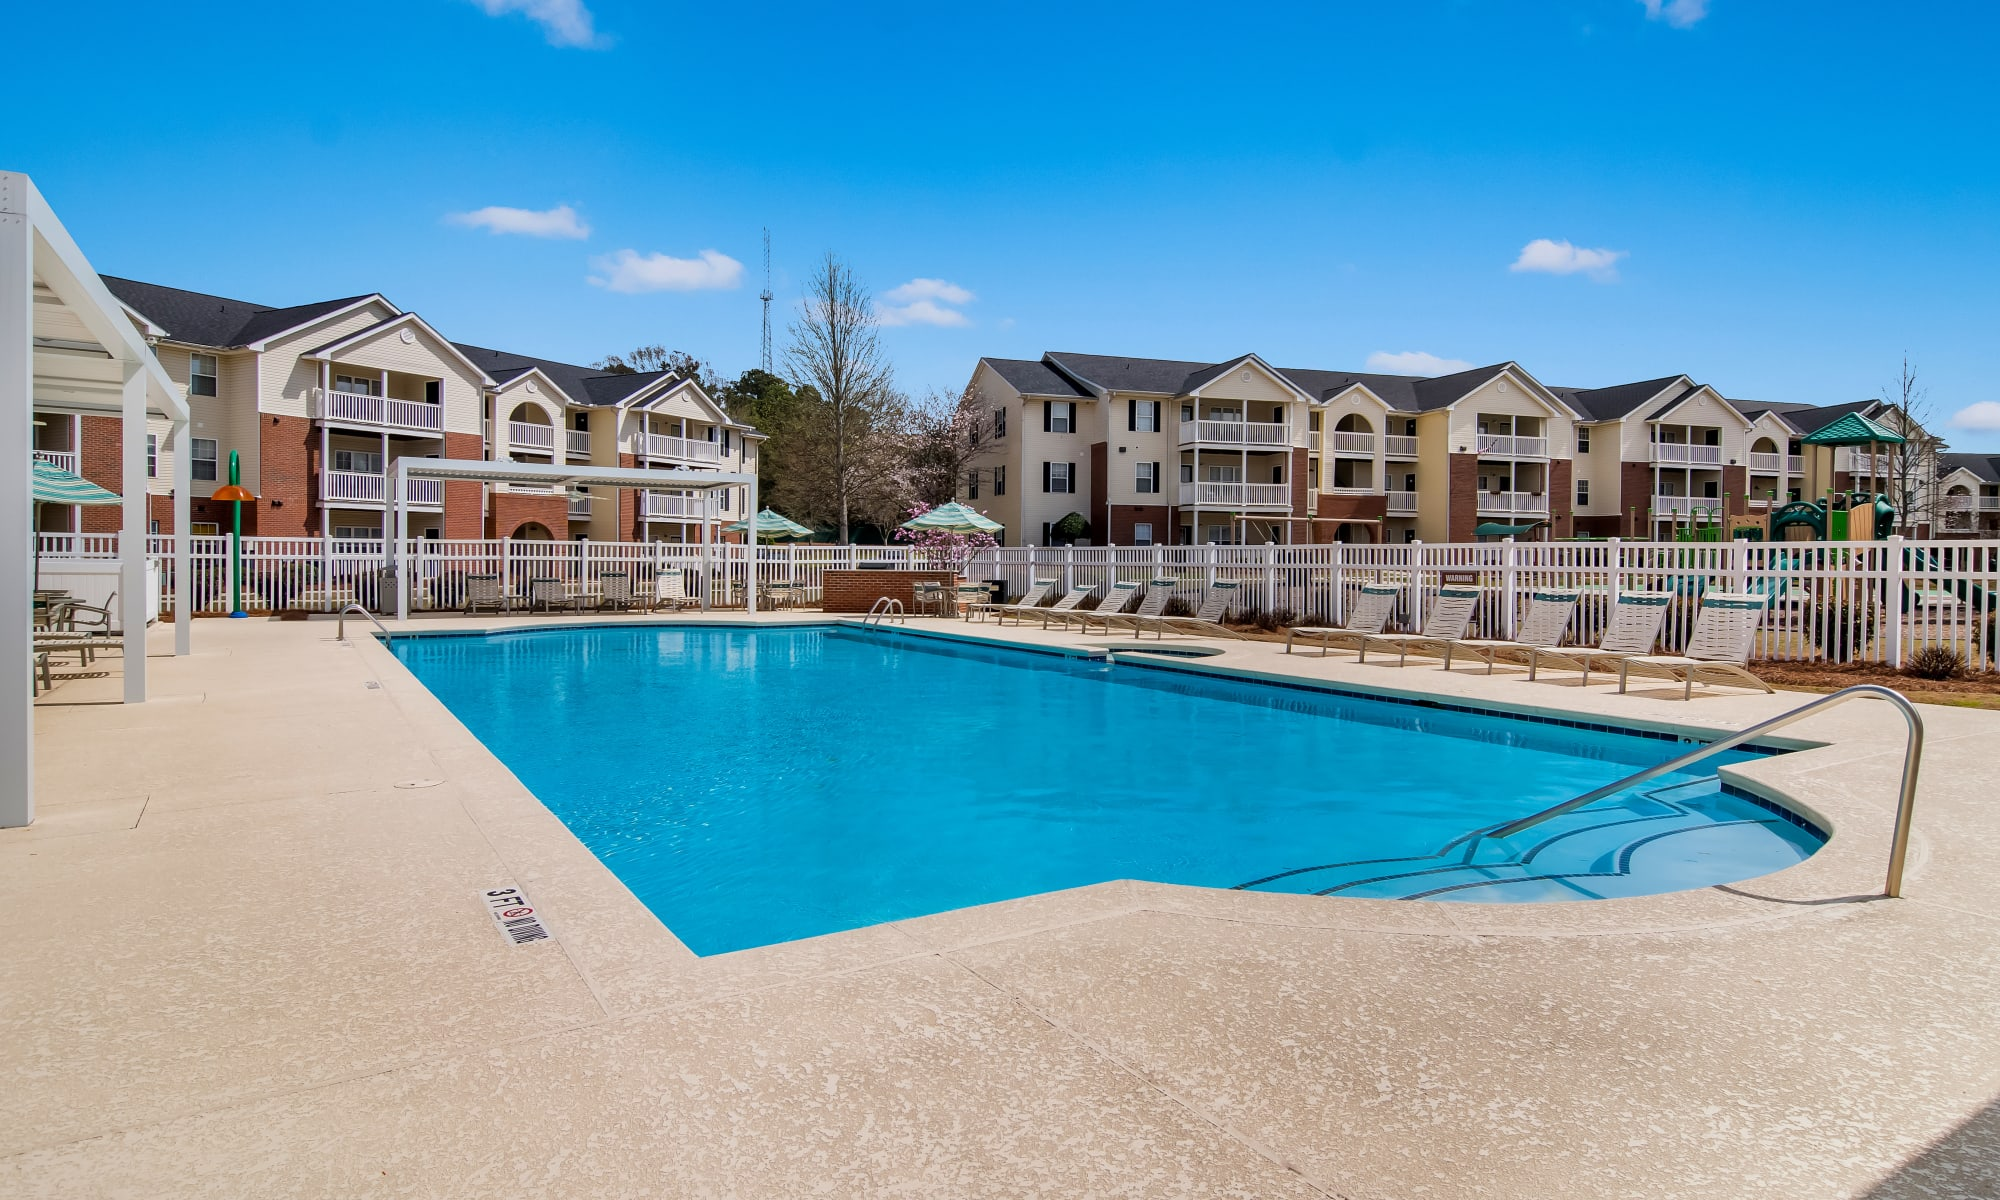 Pool at Ten68 West in Dallas, Georgia